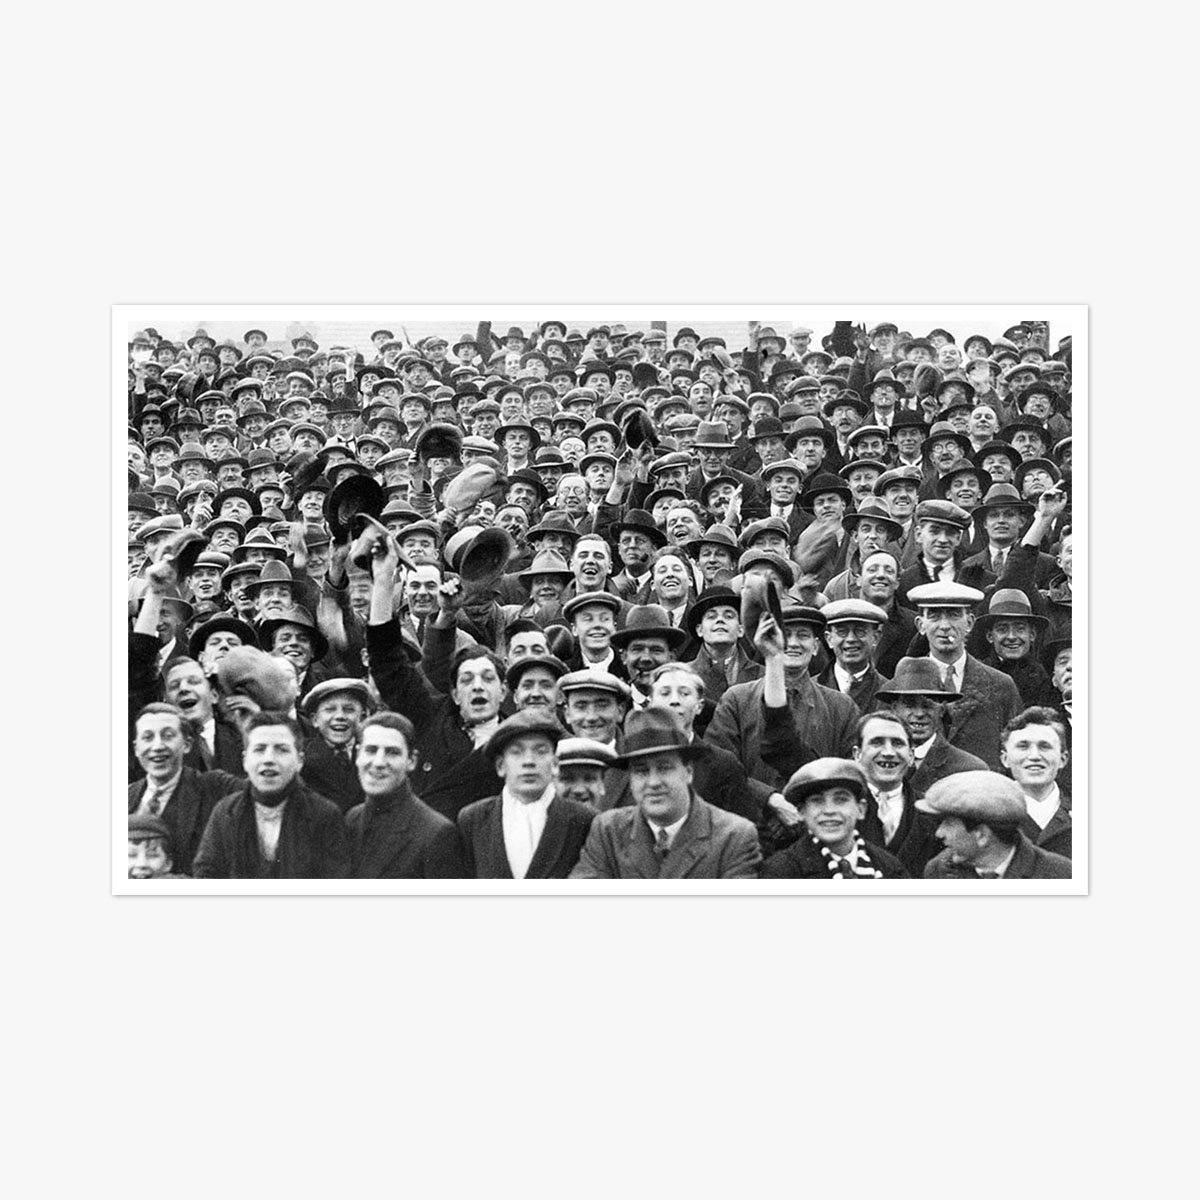 Football Fans 1930 by Frank Rust